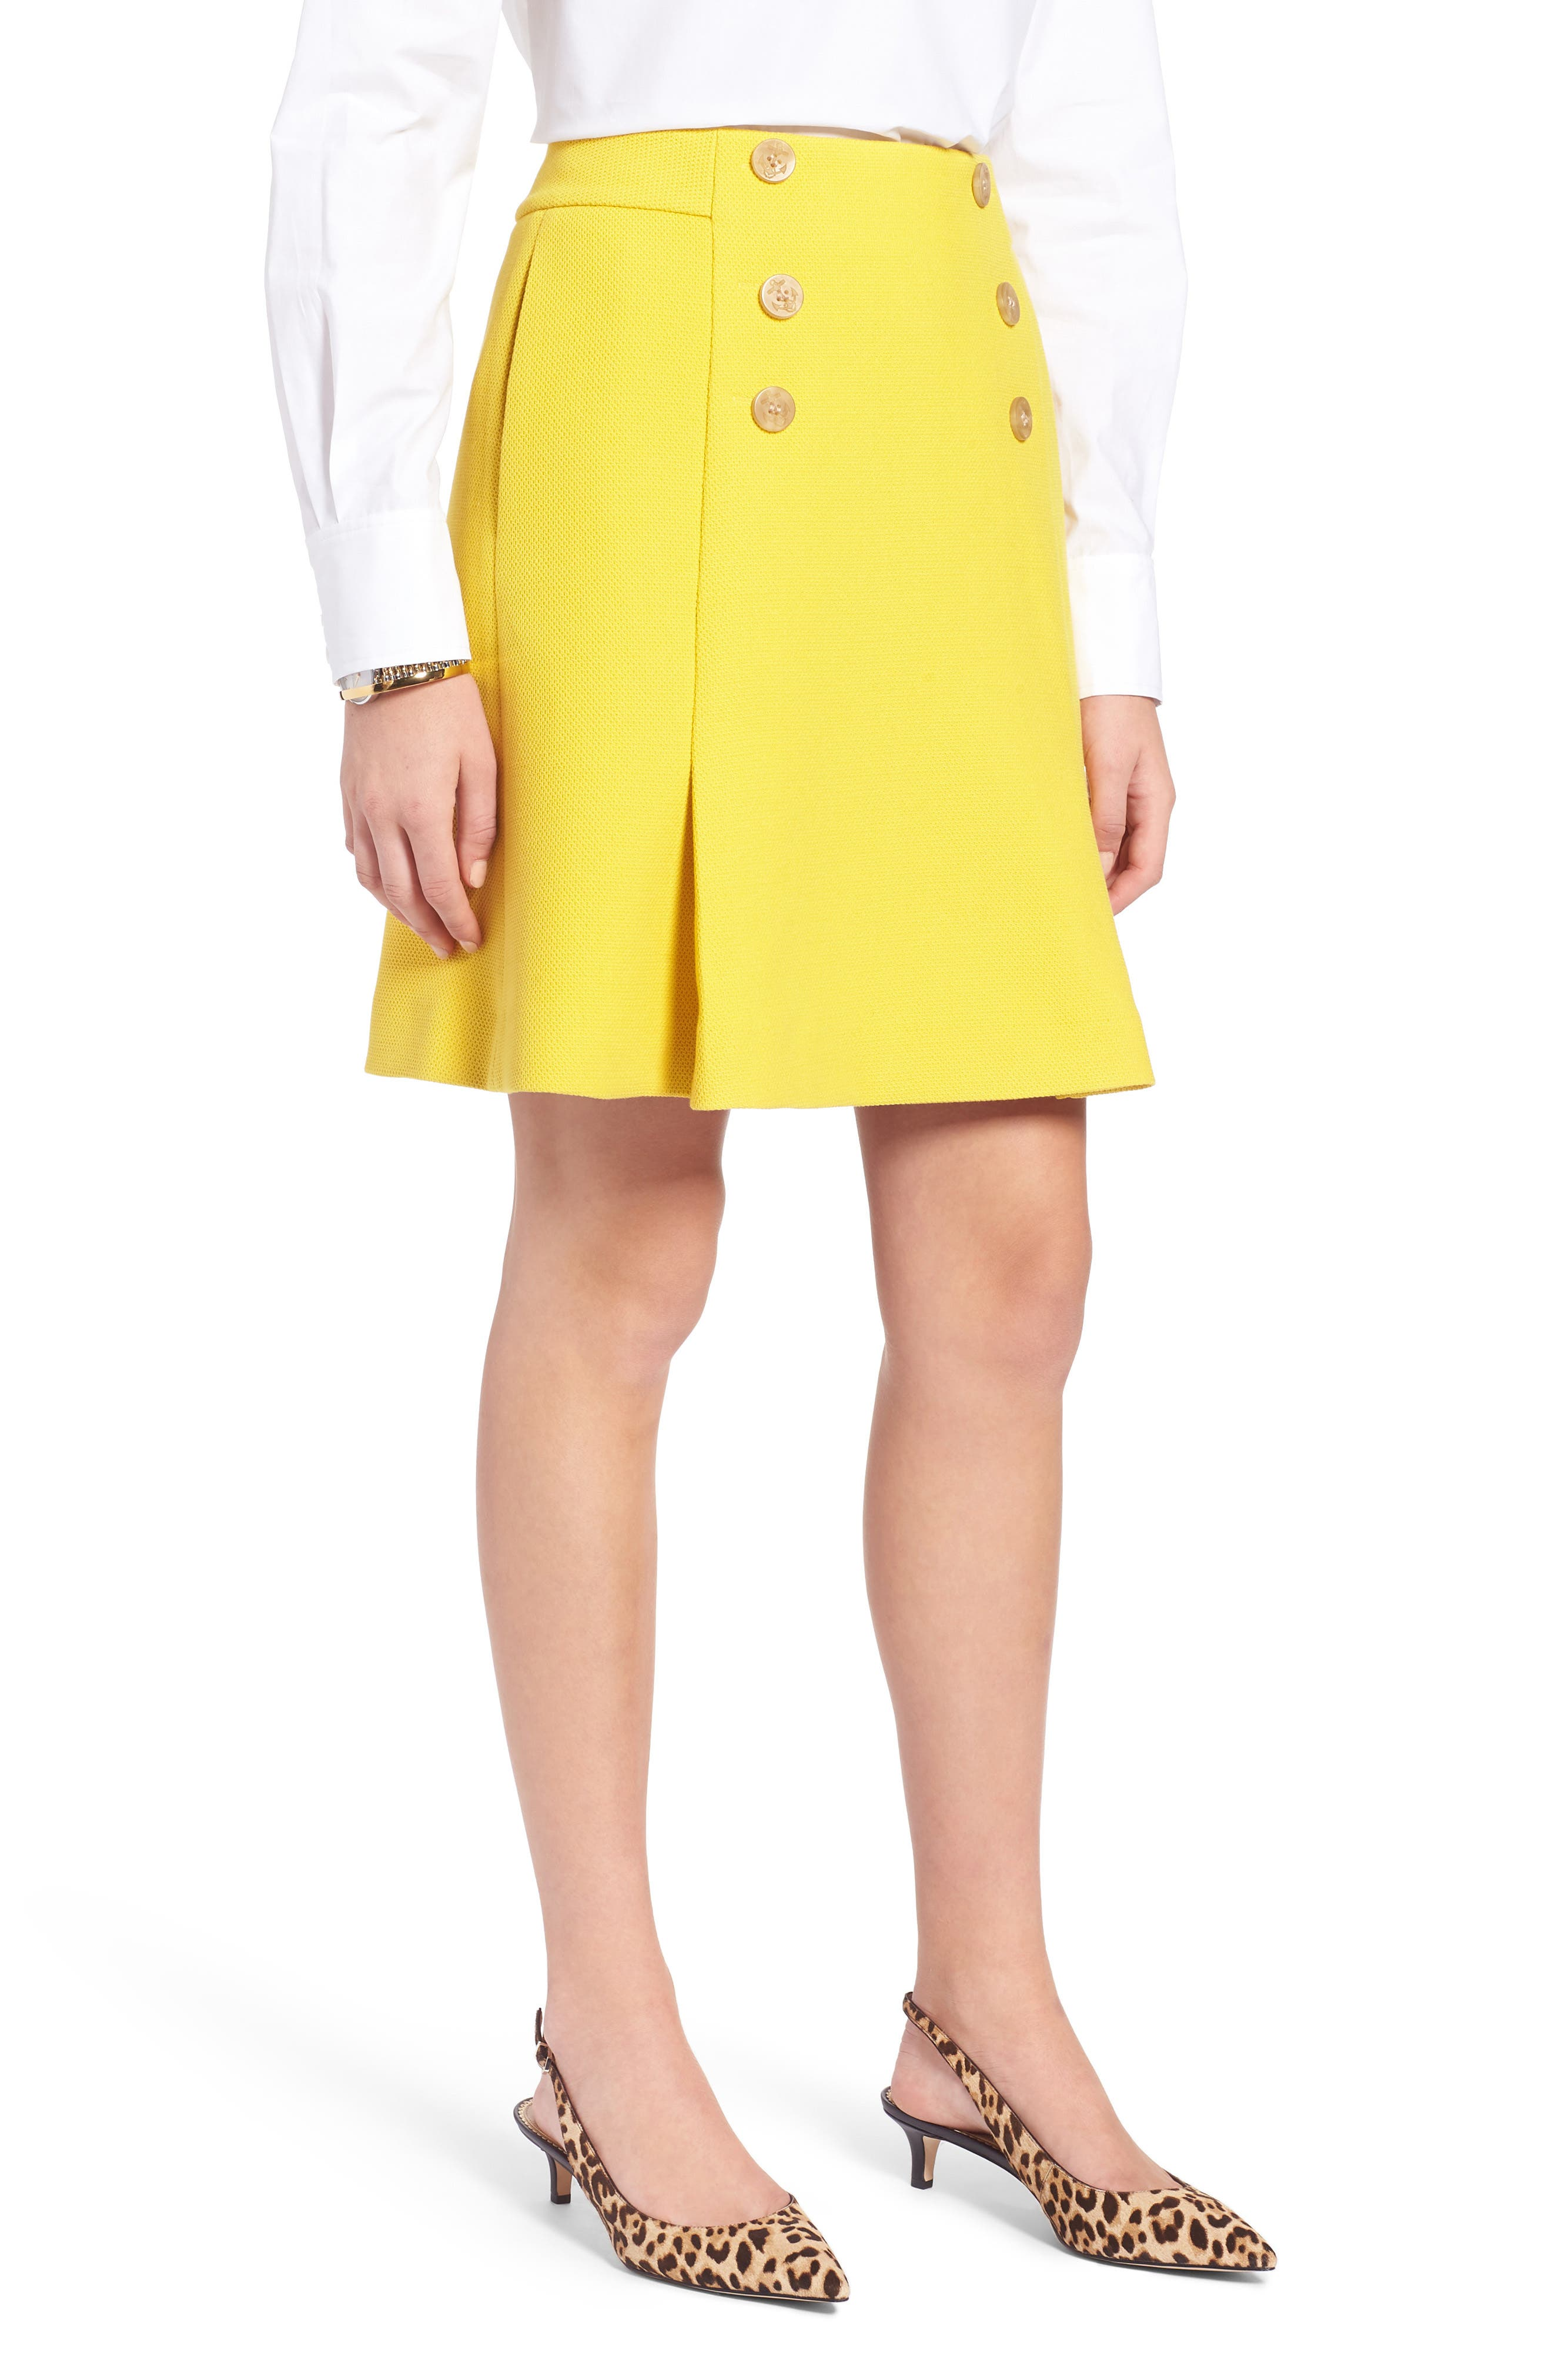 petite skirt sailor yellow